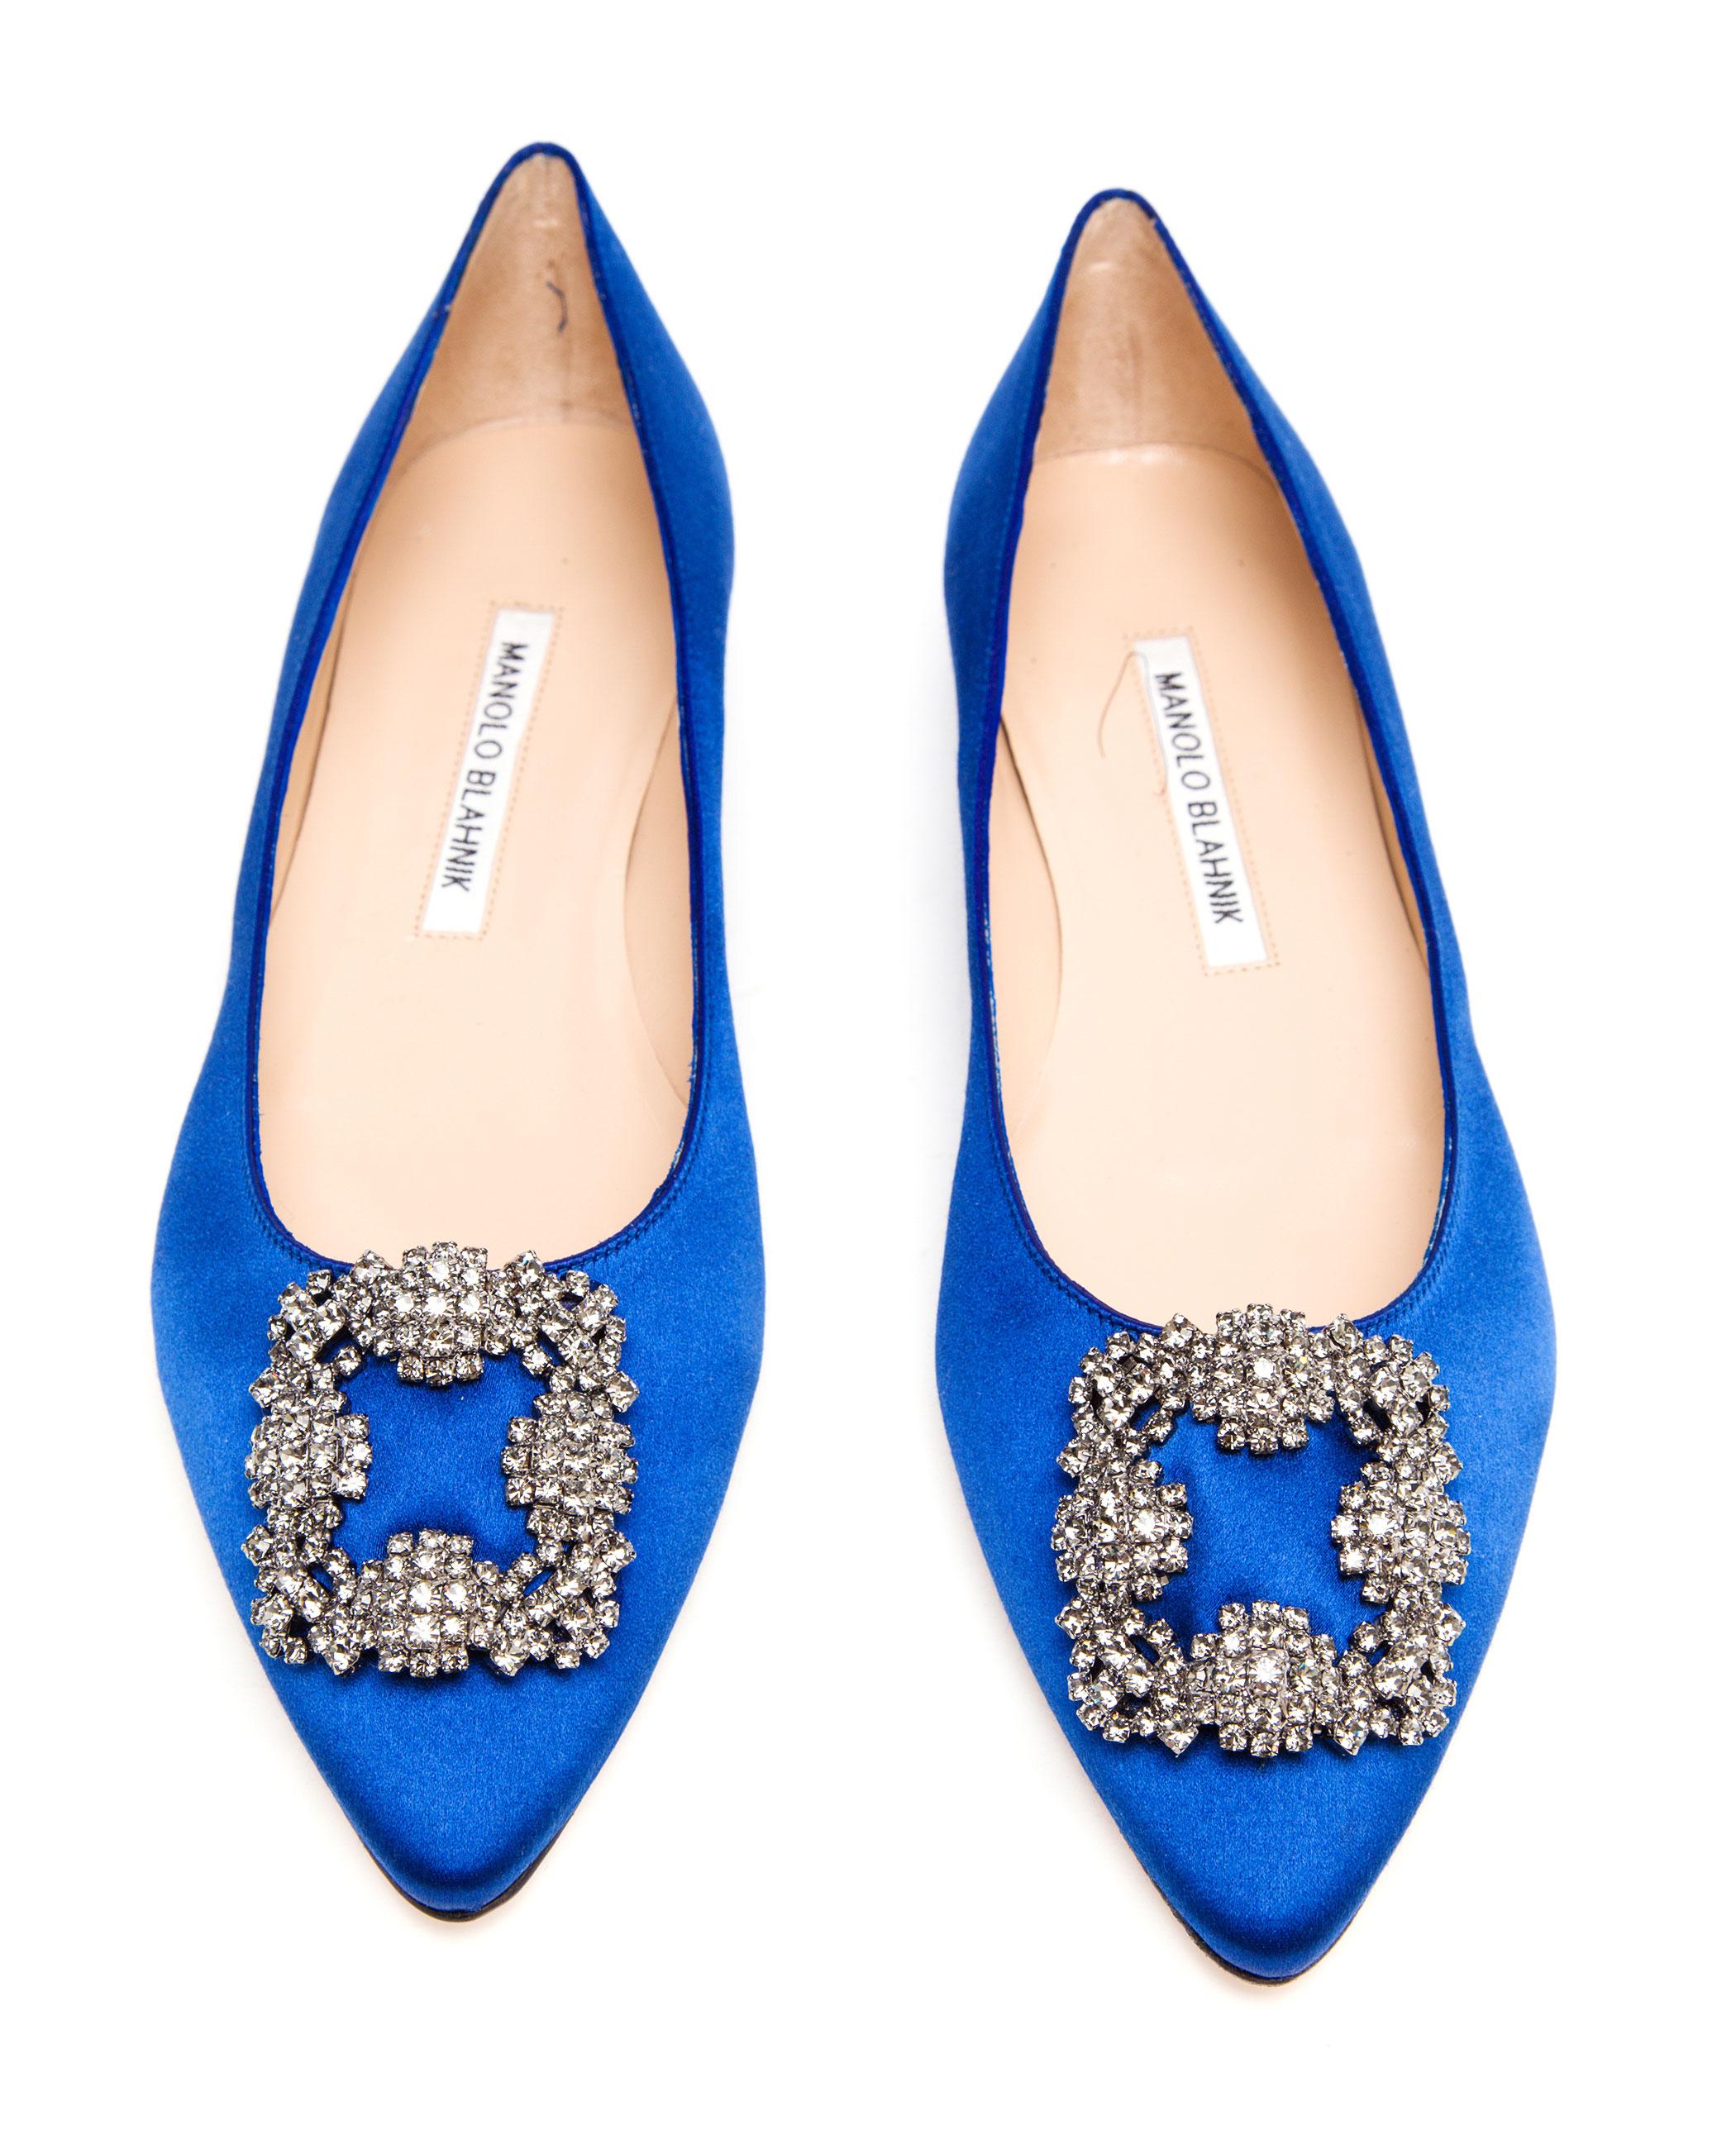 d5689775a19 ... order lyst manolo blahnik hangisi embellished satin flats in blue 16f55  60303